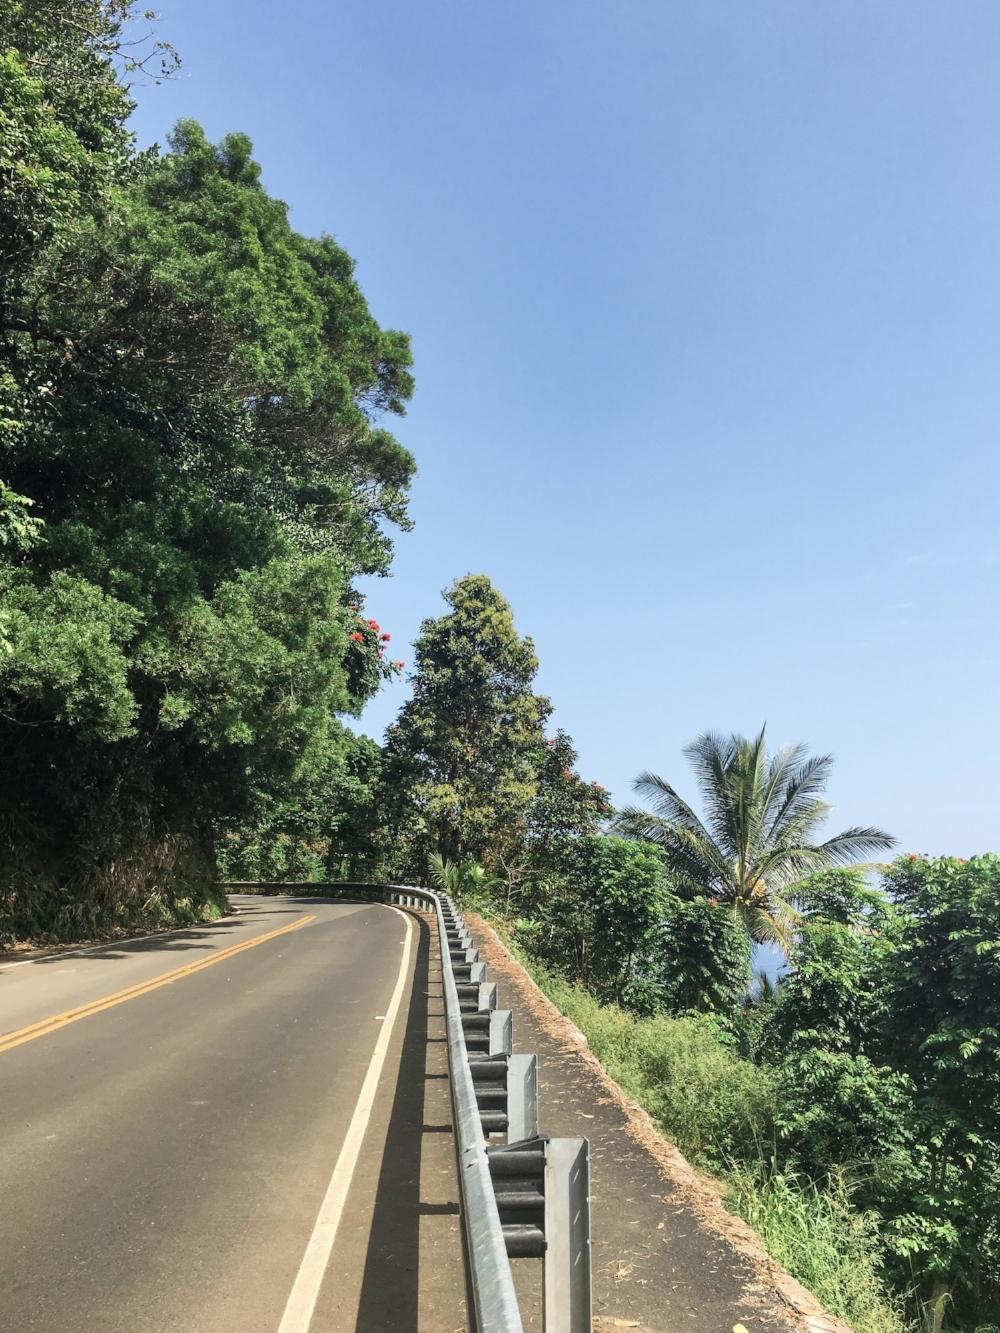 curio.trips.hawaii.maui.hana.highway.jpg